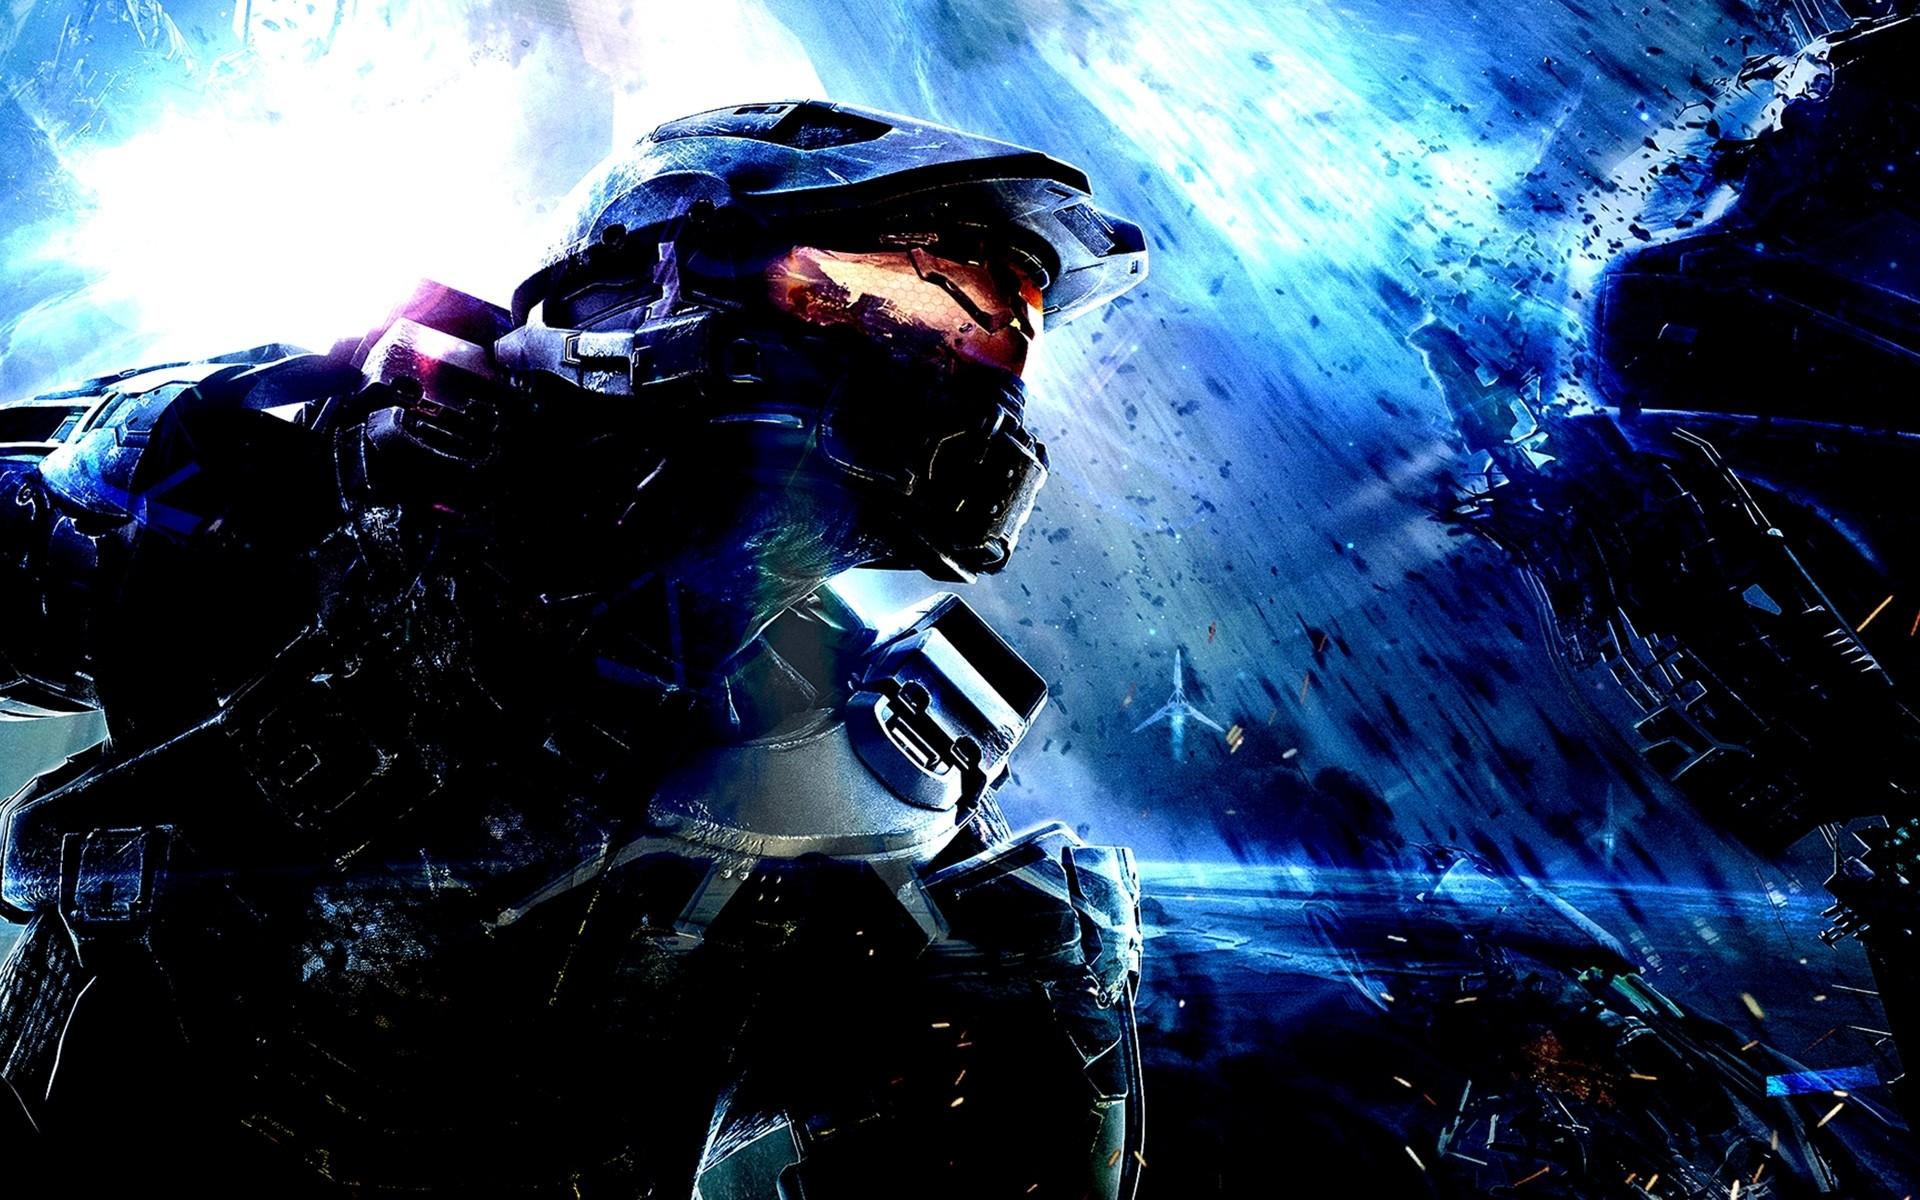 Halo 5 Wallpaper